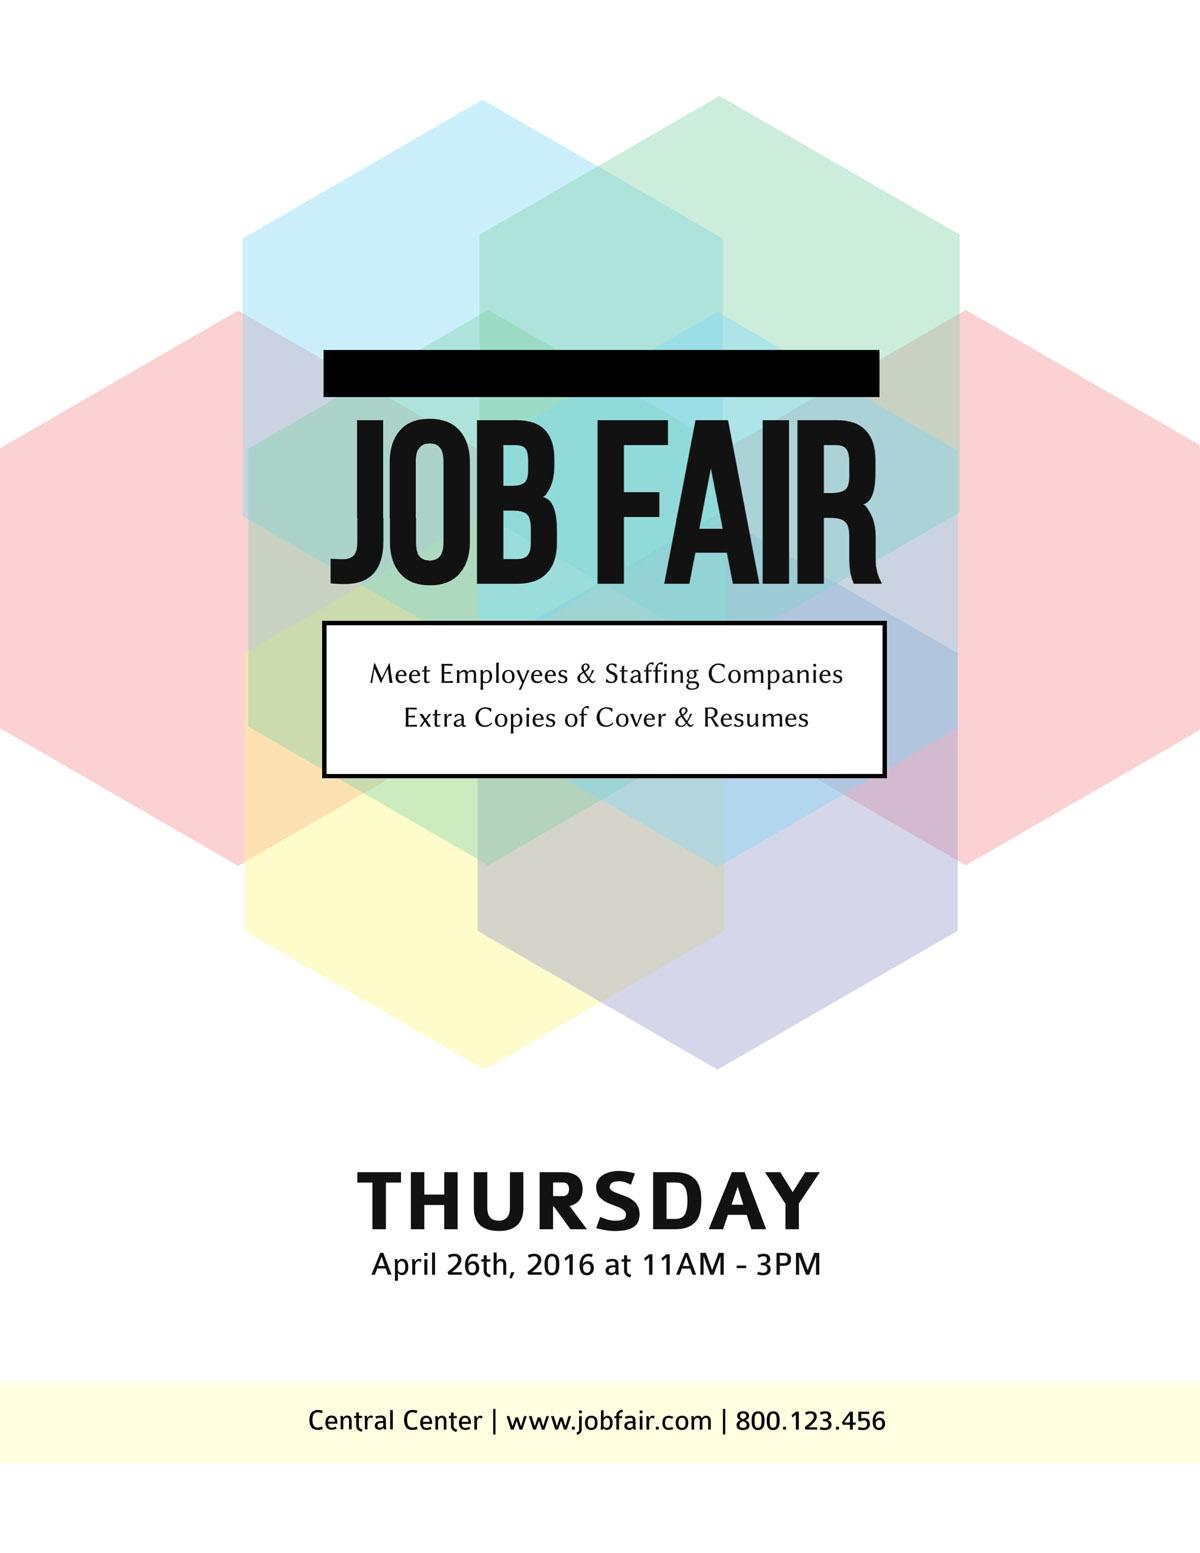 flyer templates - job fair